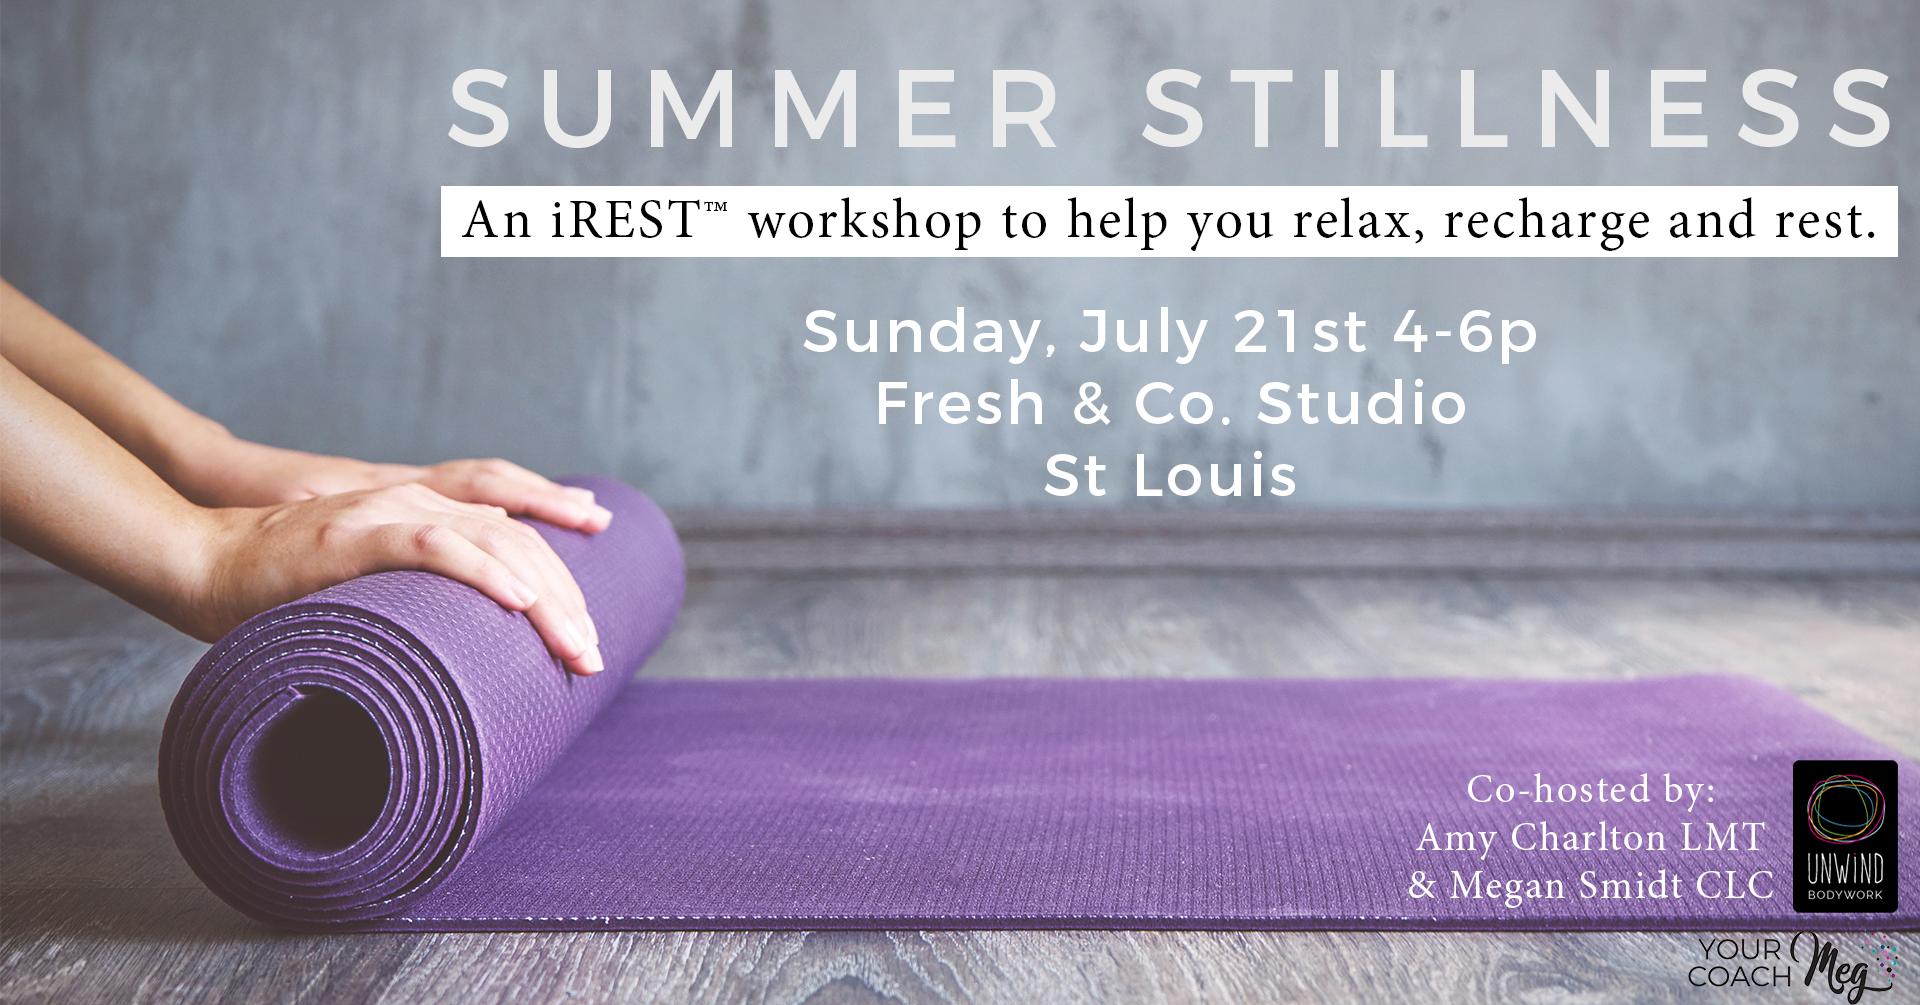 SUMMR STILLNESS WKSHP yoga nidra stress relief st louis